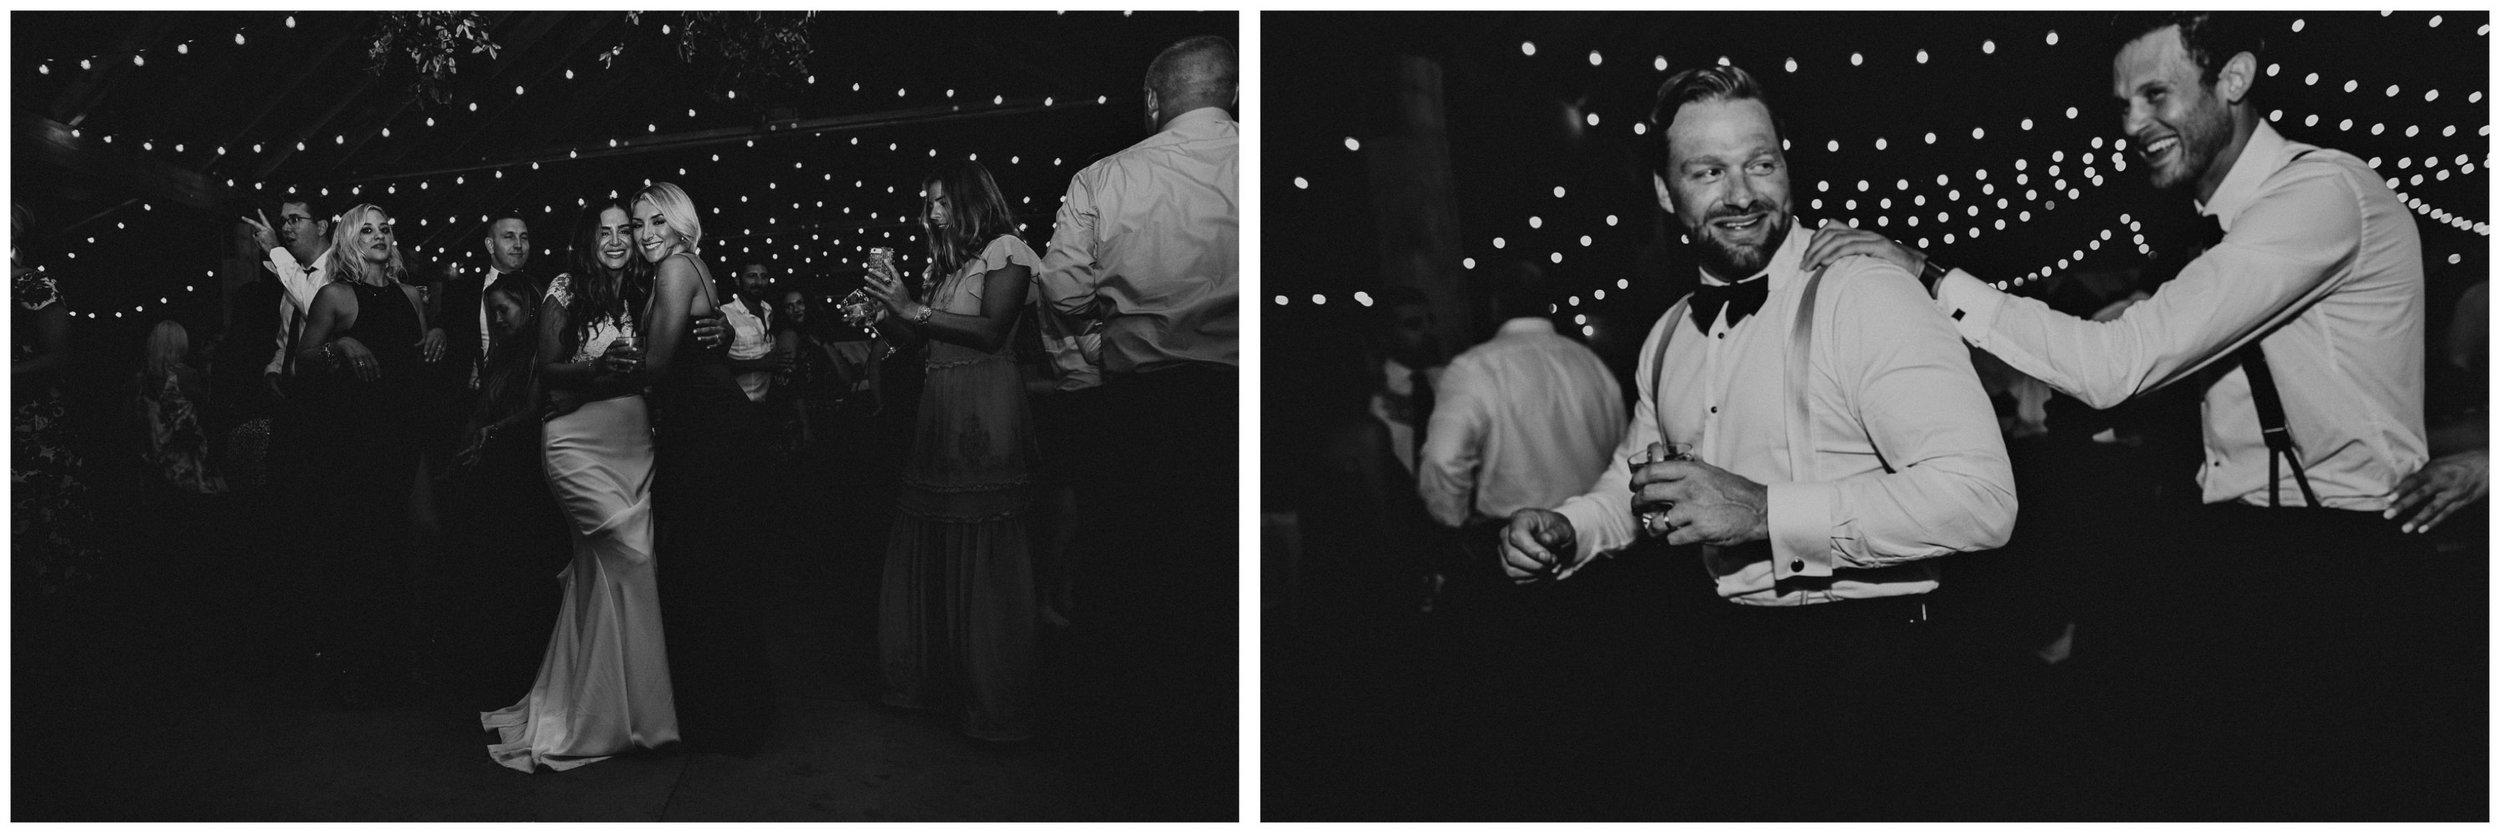 137 - Fun Wedding Reception at serenbi farms atlanta .jpg